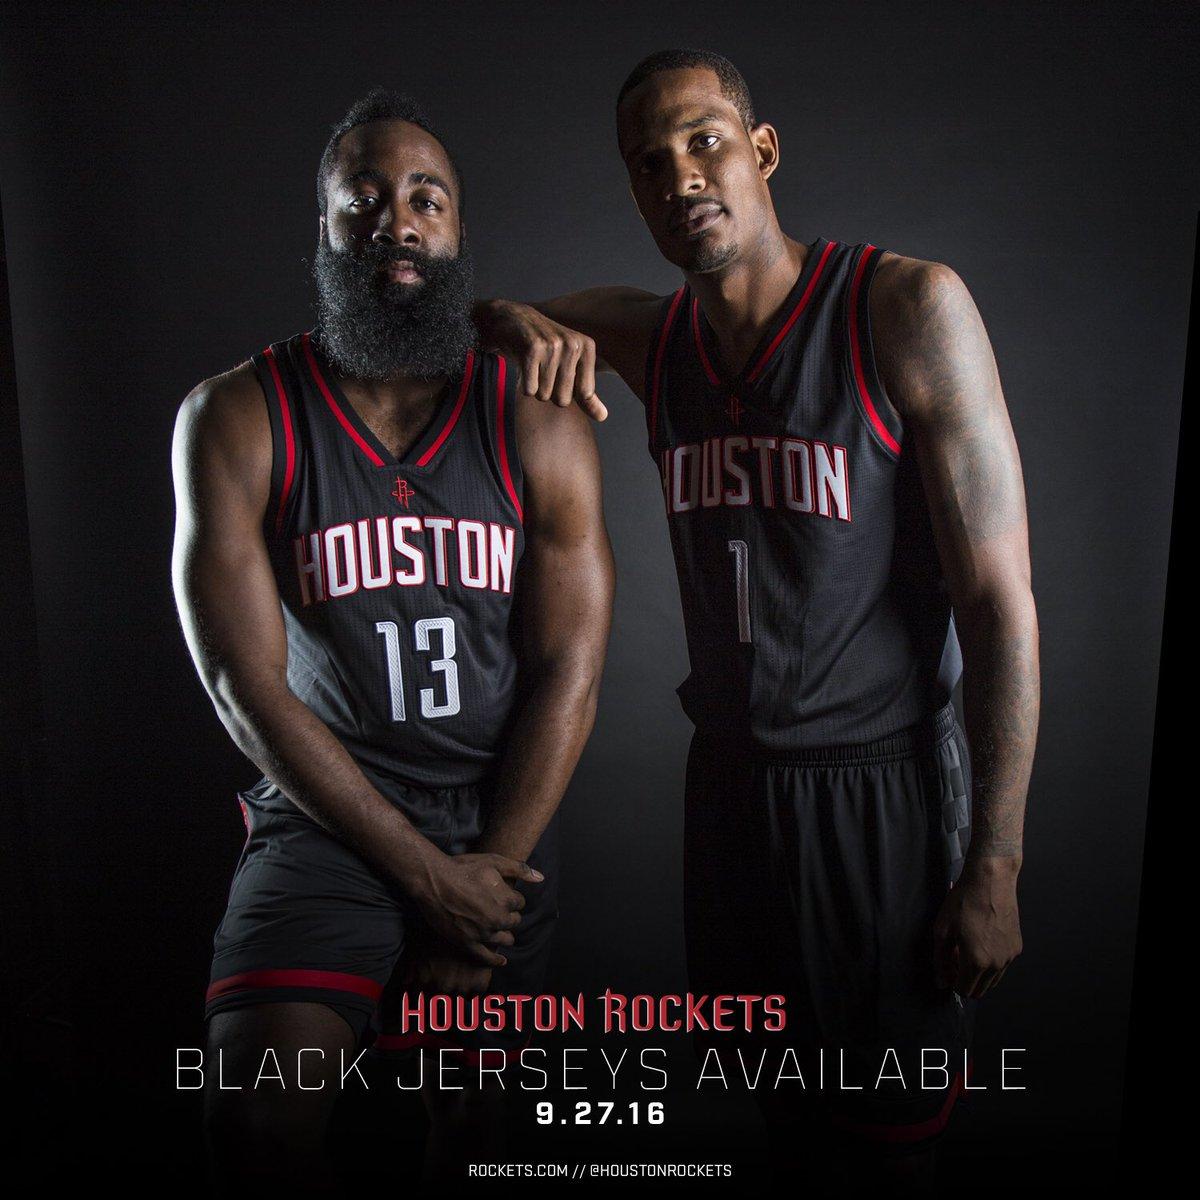 Warriors Vs Wolves Full Game Highlights: Houston Presenta Un Nuevo Uniforme De Color Negro